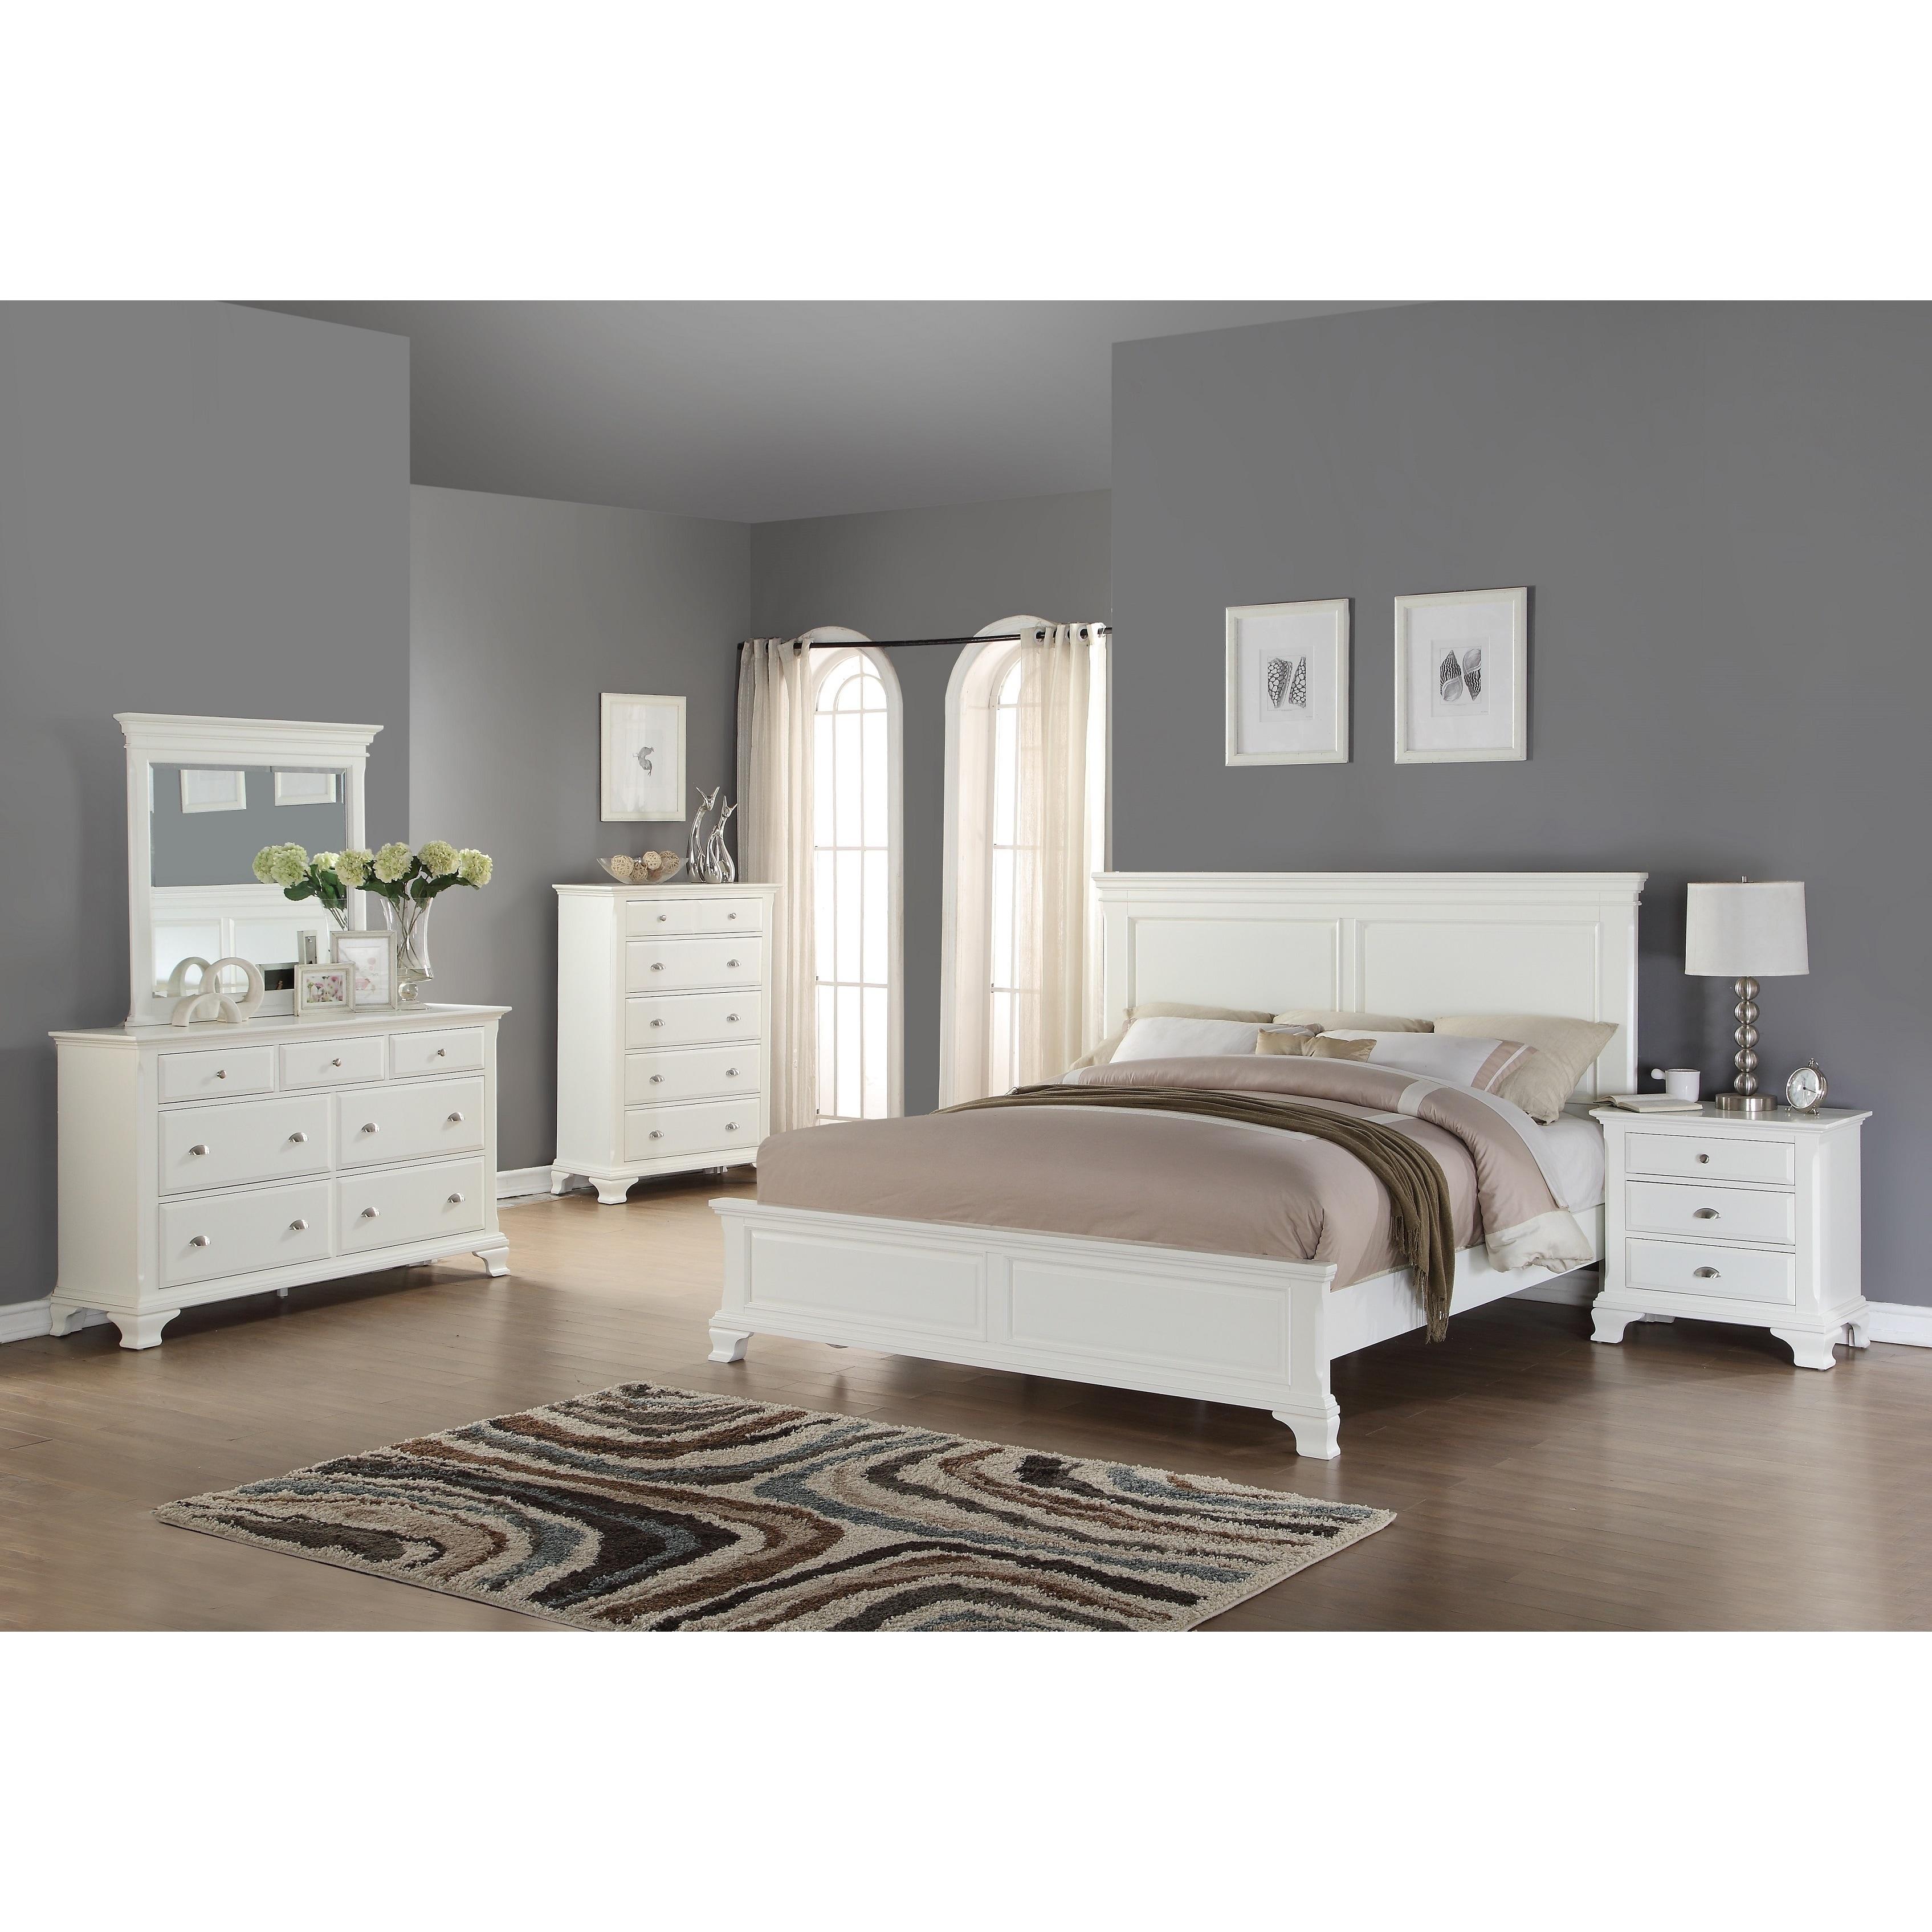 Laveno 012 White Wood Bedroom Furniture